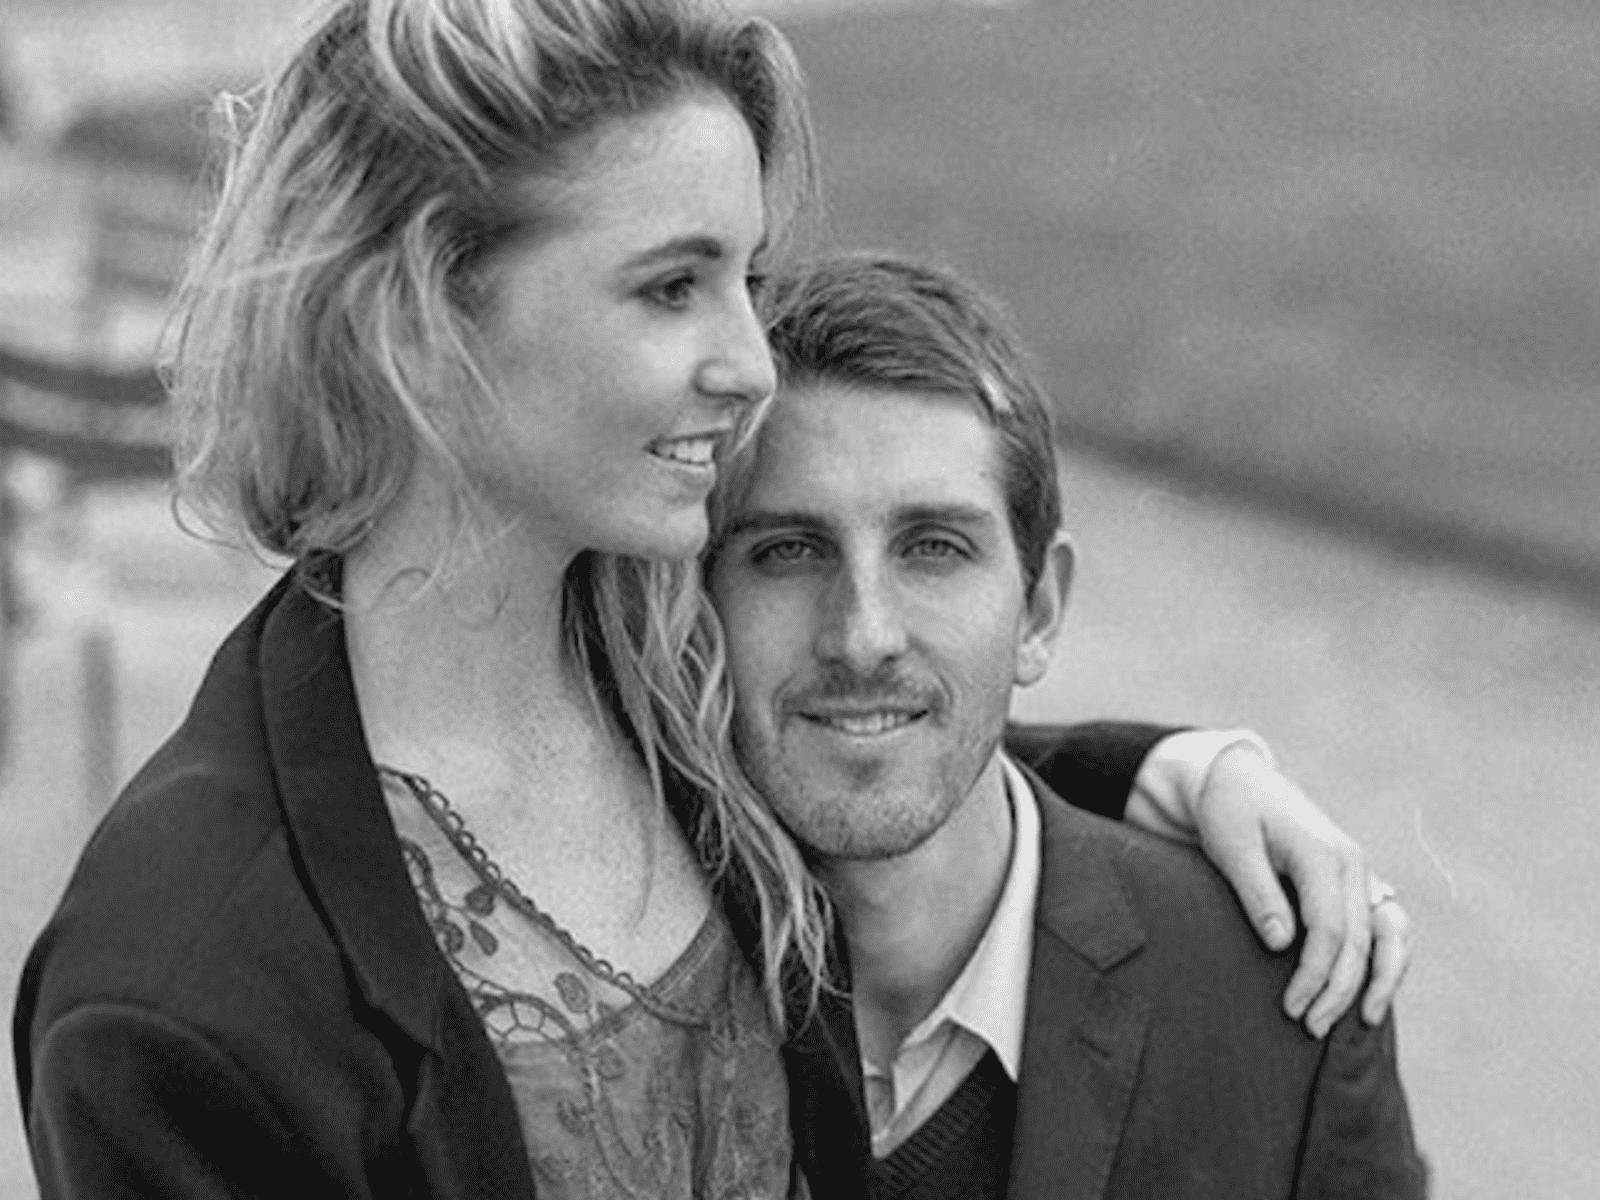 Simone & Matthew from Paris, France